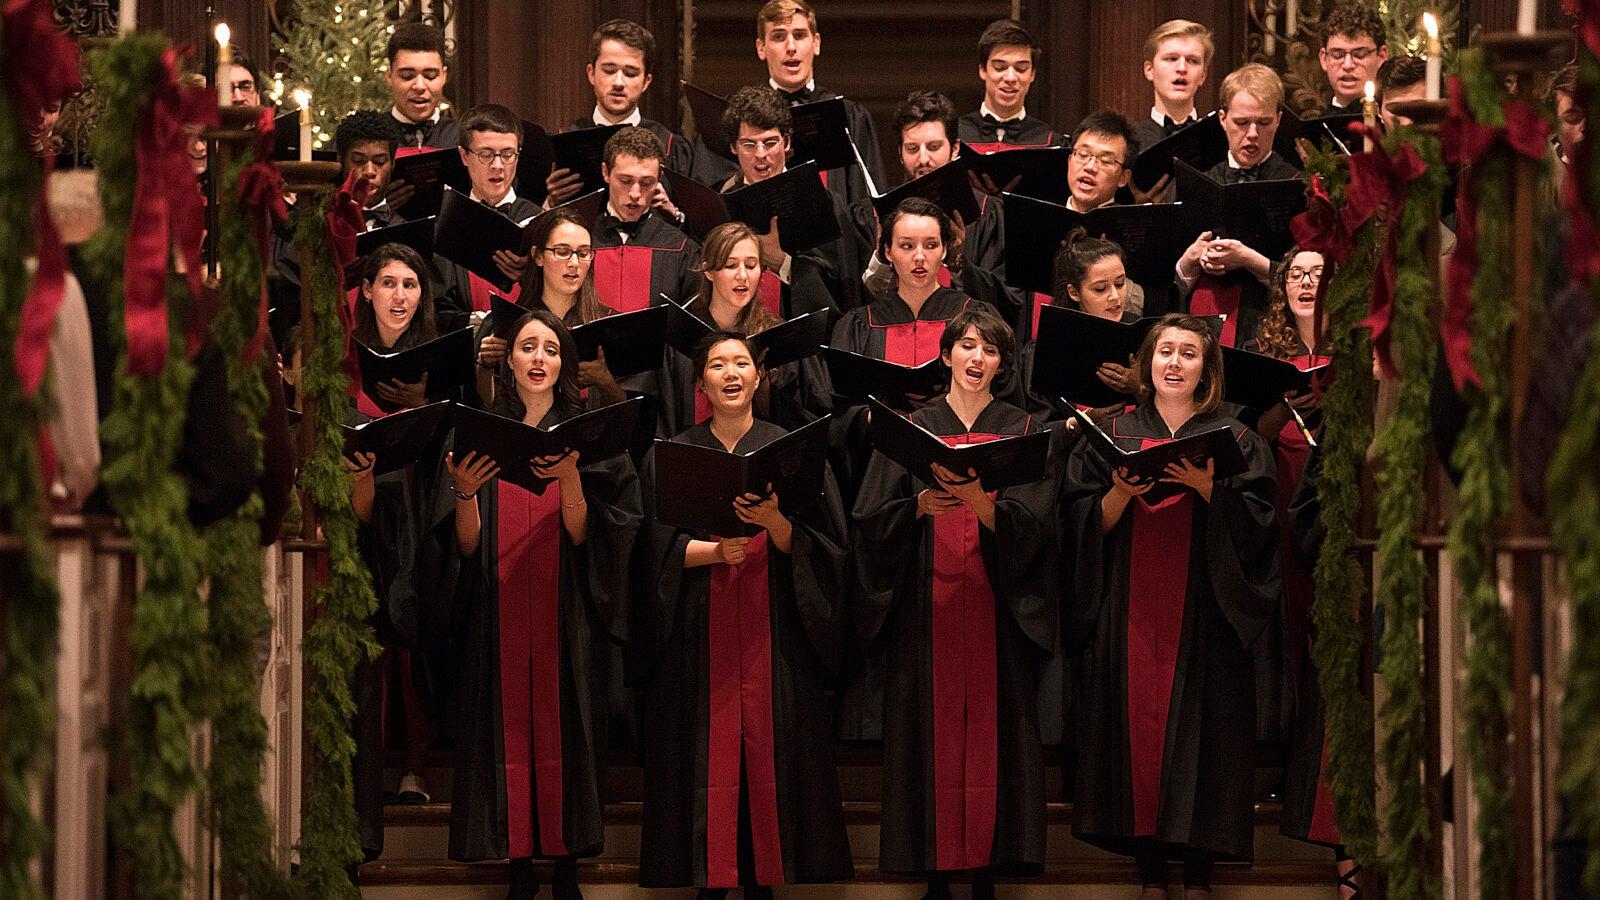 Harvard choir performs.